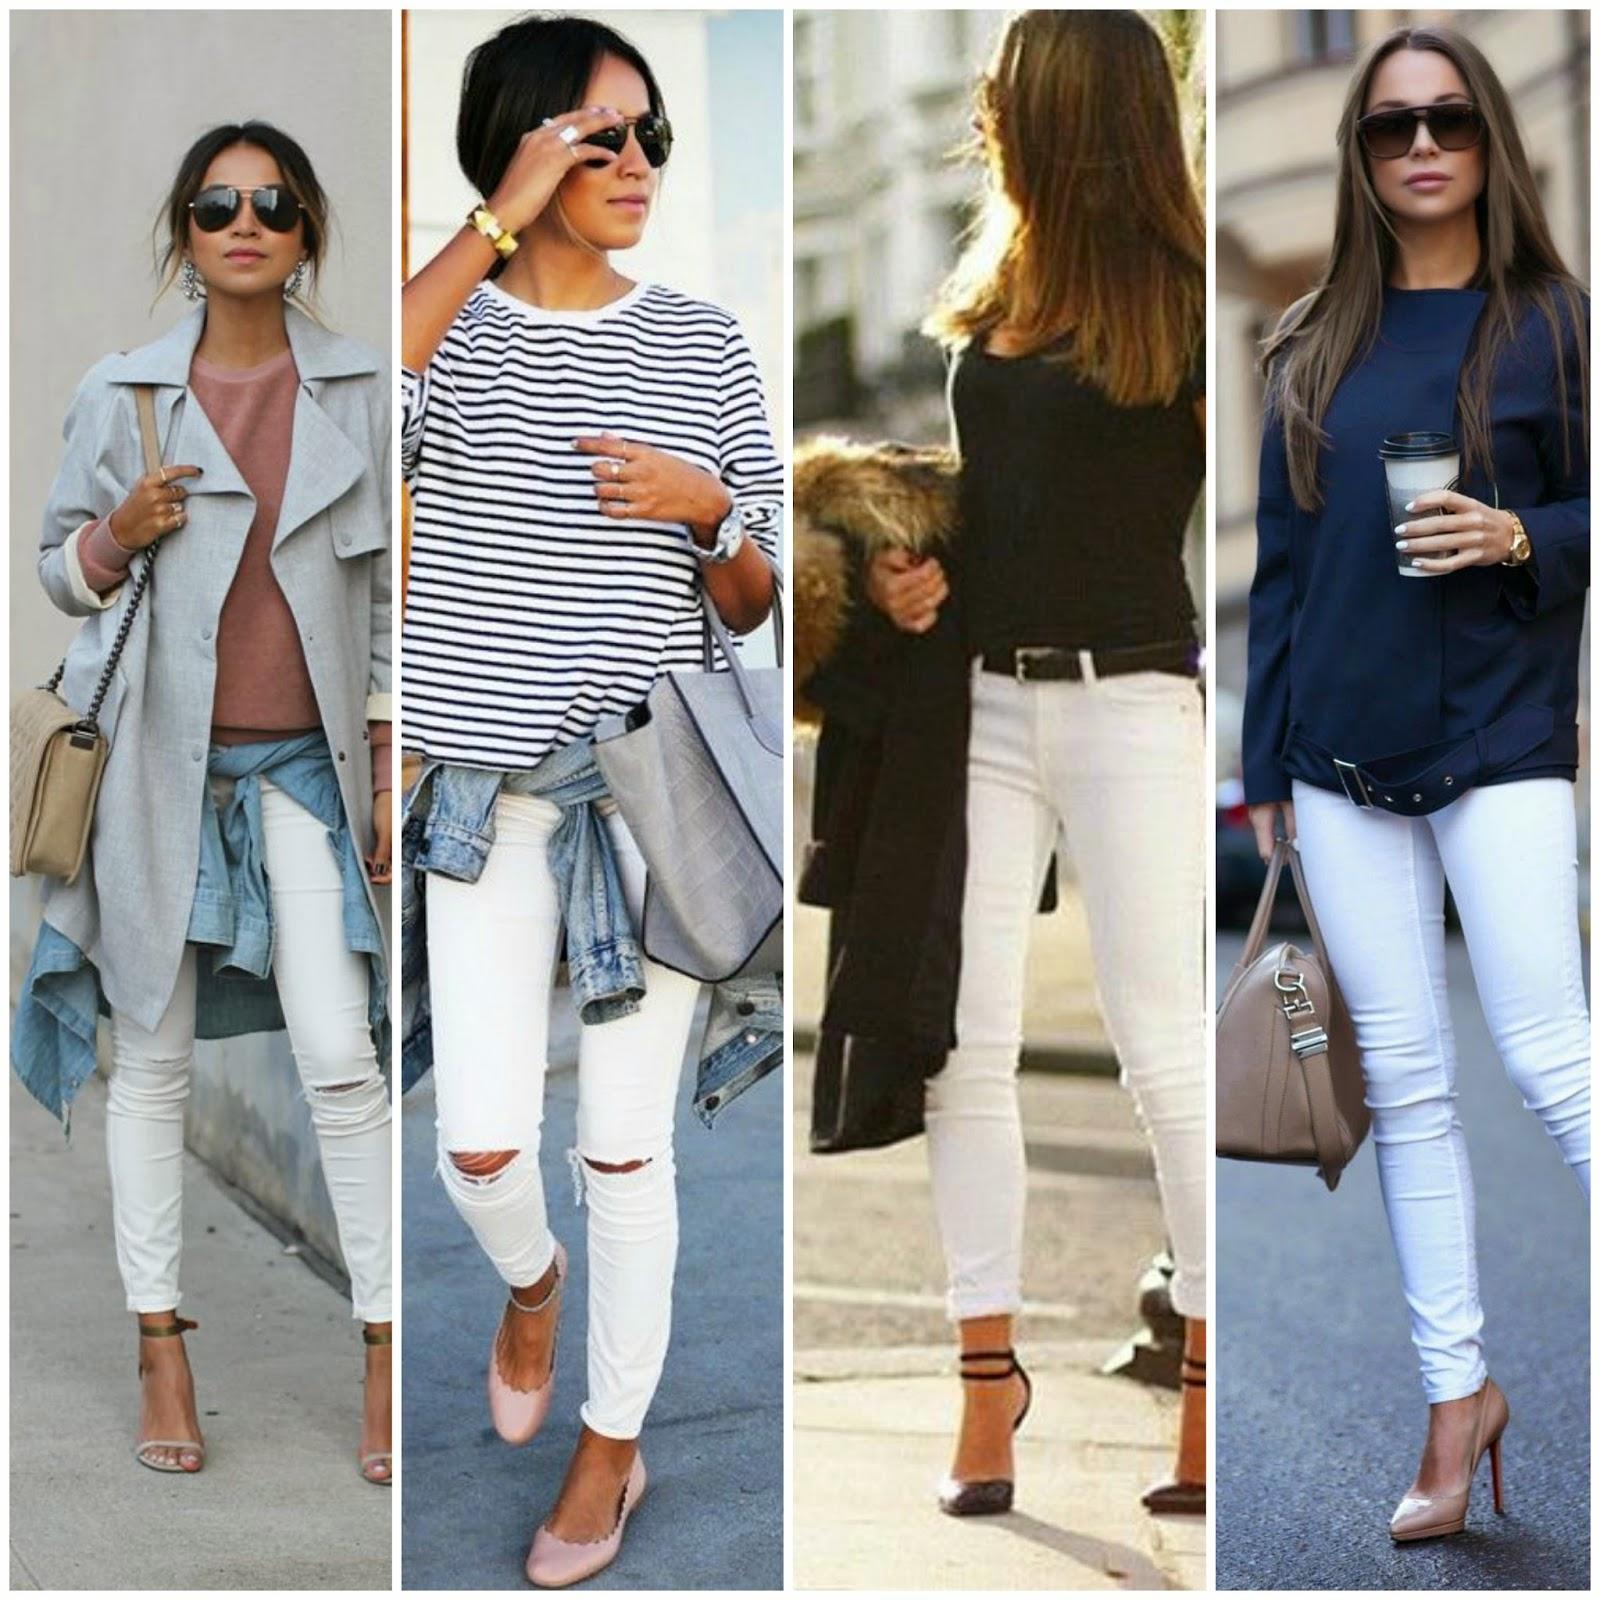 b477dd80740 Styling | The White Jean | Fashion Chai